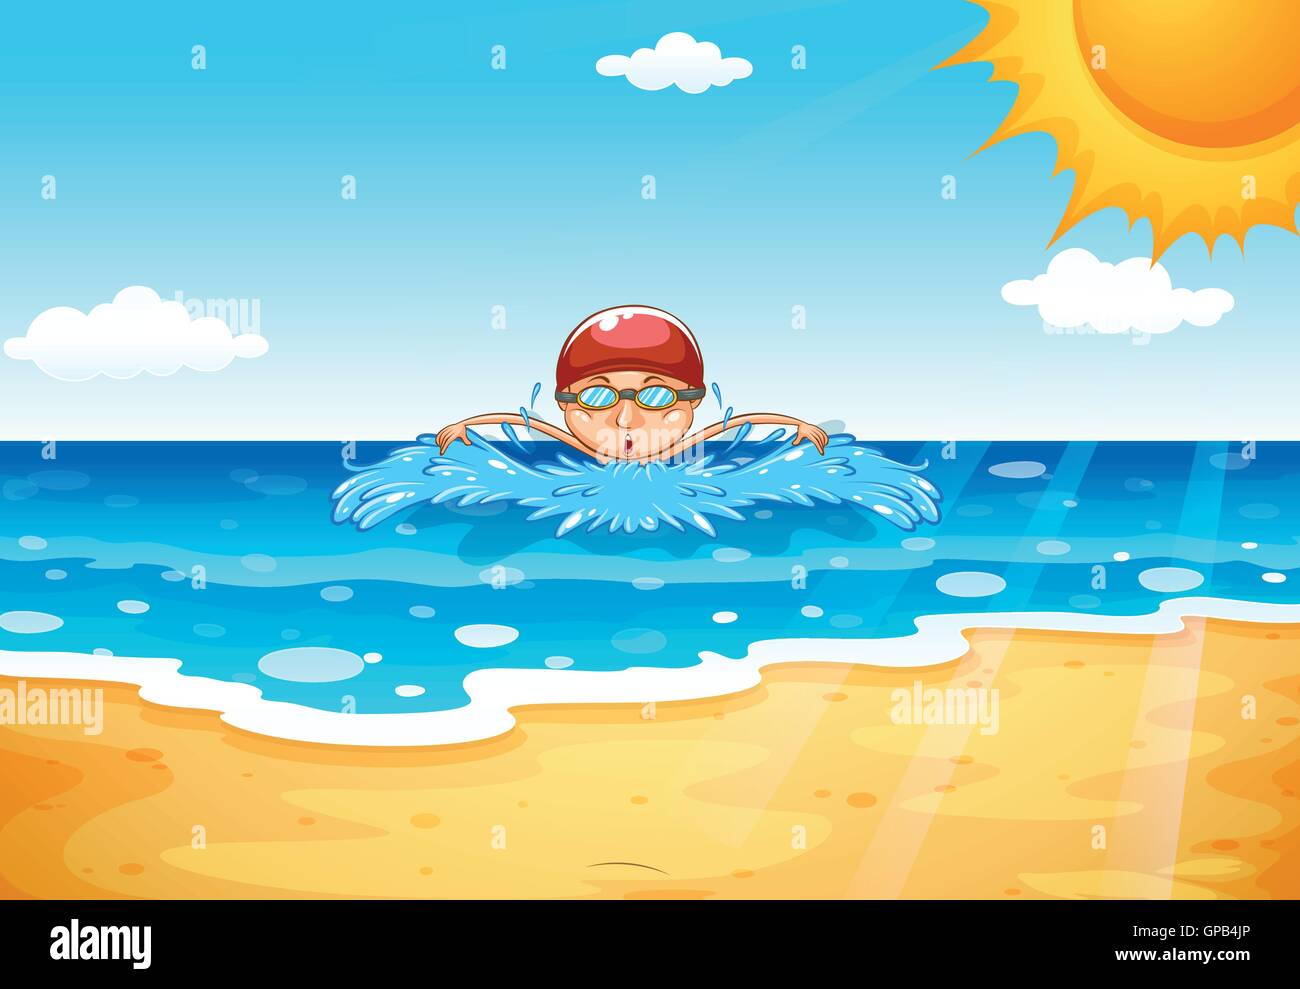 Man swimming in the ocean illustration Stock Vector Art ...